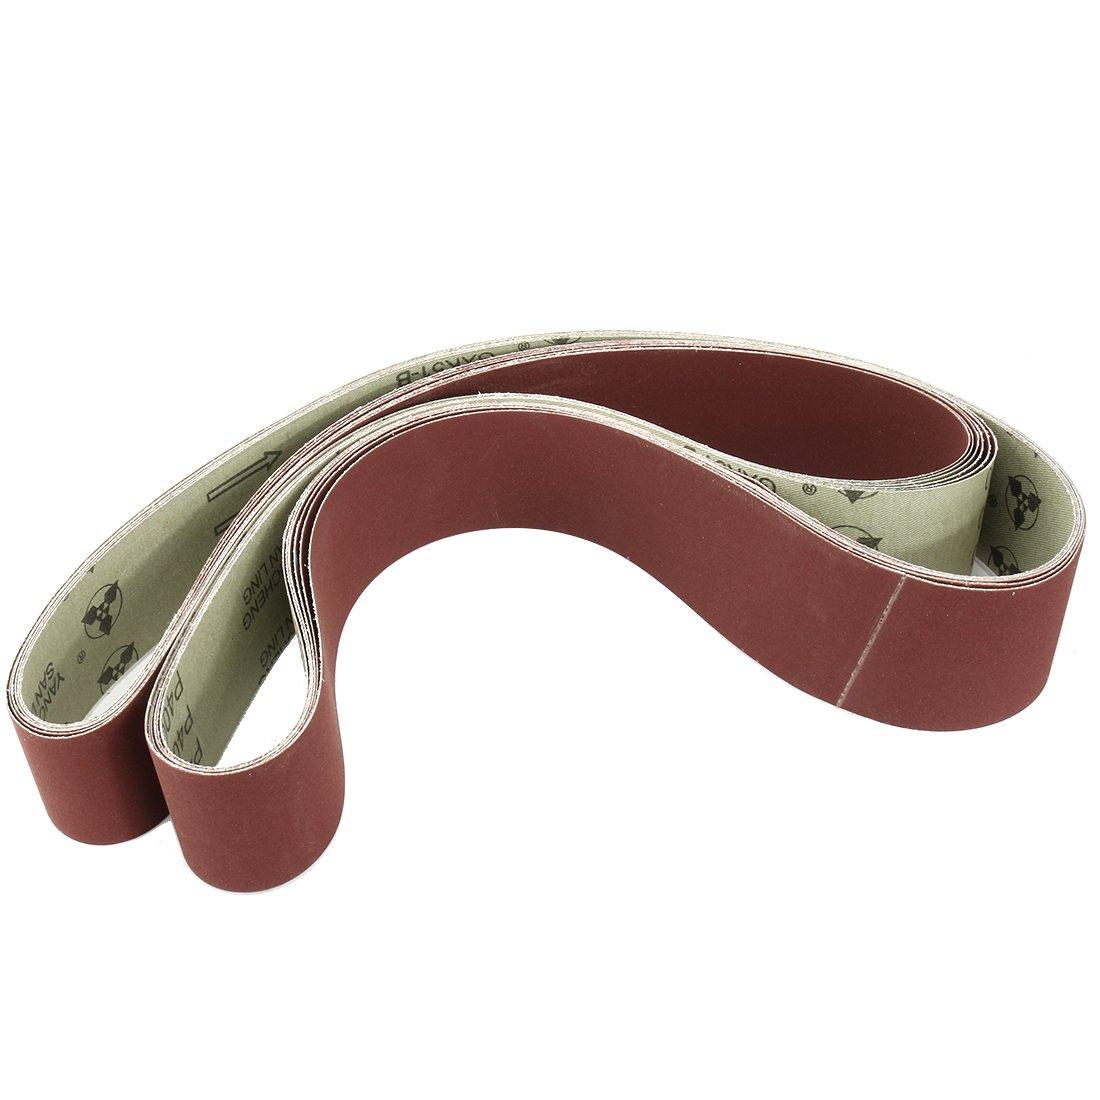 uxcell 2-Inch x 72-Inch 400 Grit Tape Butt Joint Aluminum Oxide Sanding Belt 6pcs